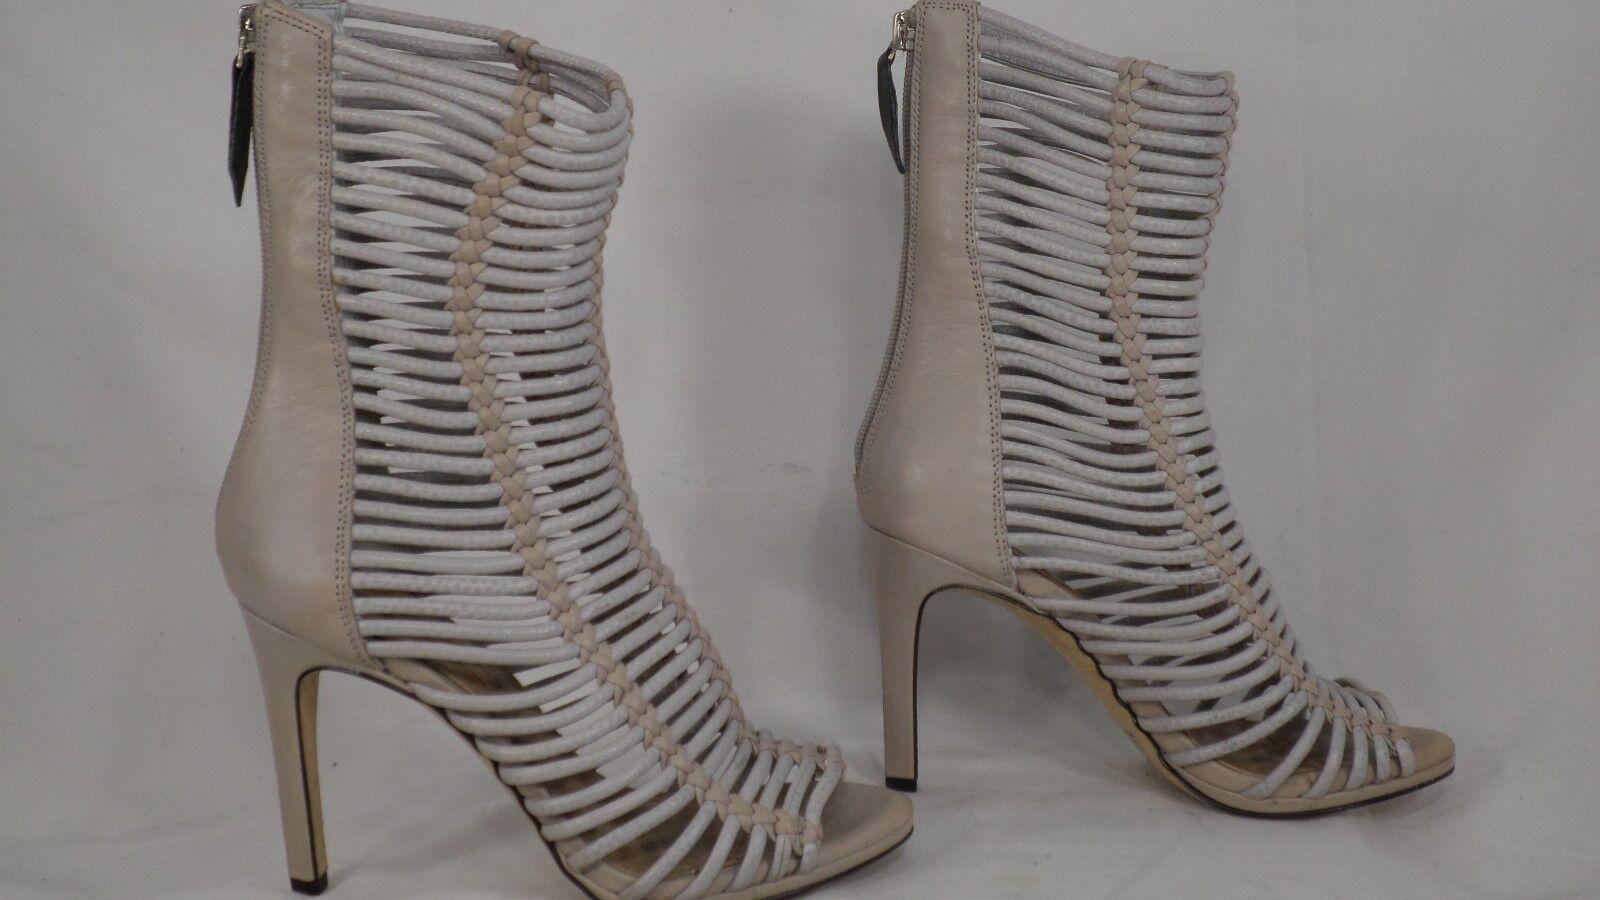 BCBGMAXAZARIA 'Ledder' Light Gray Caged Leder Bootie Sandale Damens Größe 5.5 M